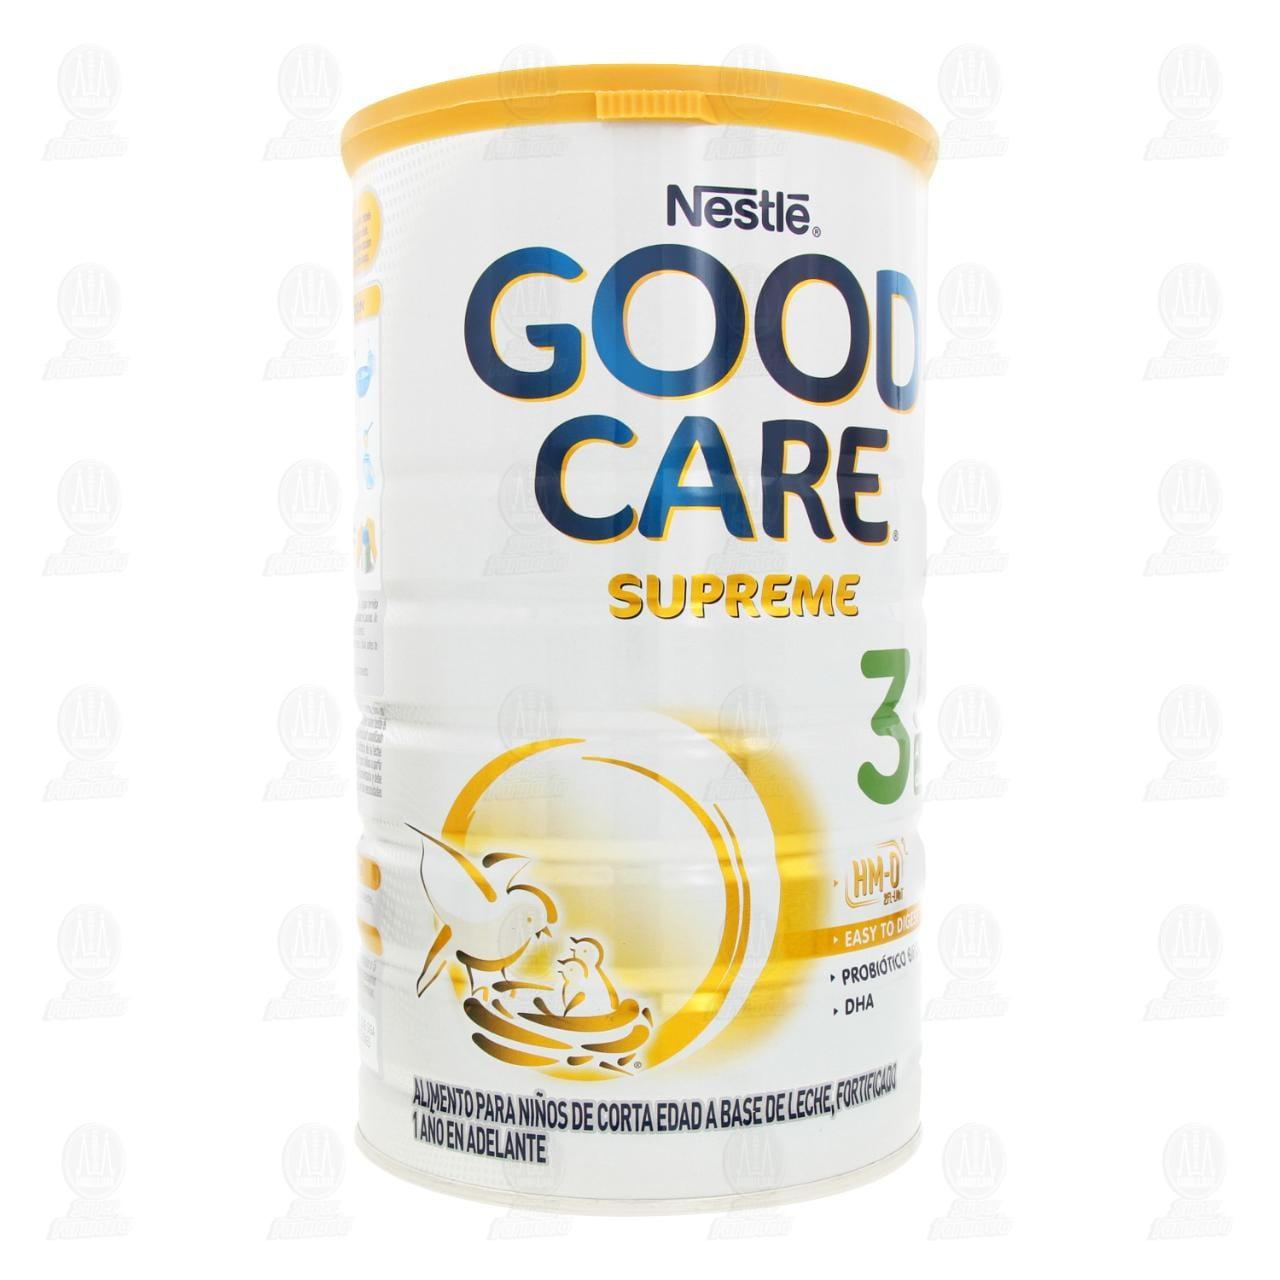 Comprar Fórmula Infantil Nestlé Good Care Optipro Supreme 3 en Polvo (A Partir del 1er Año), 1.2 kg. en Farmacias Guadalajara